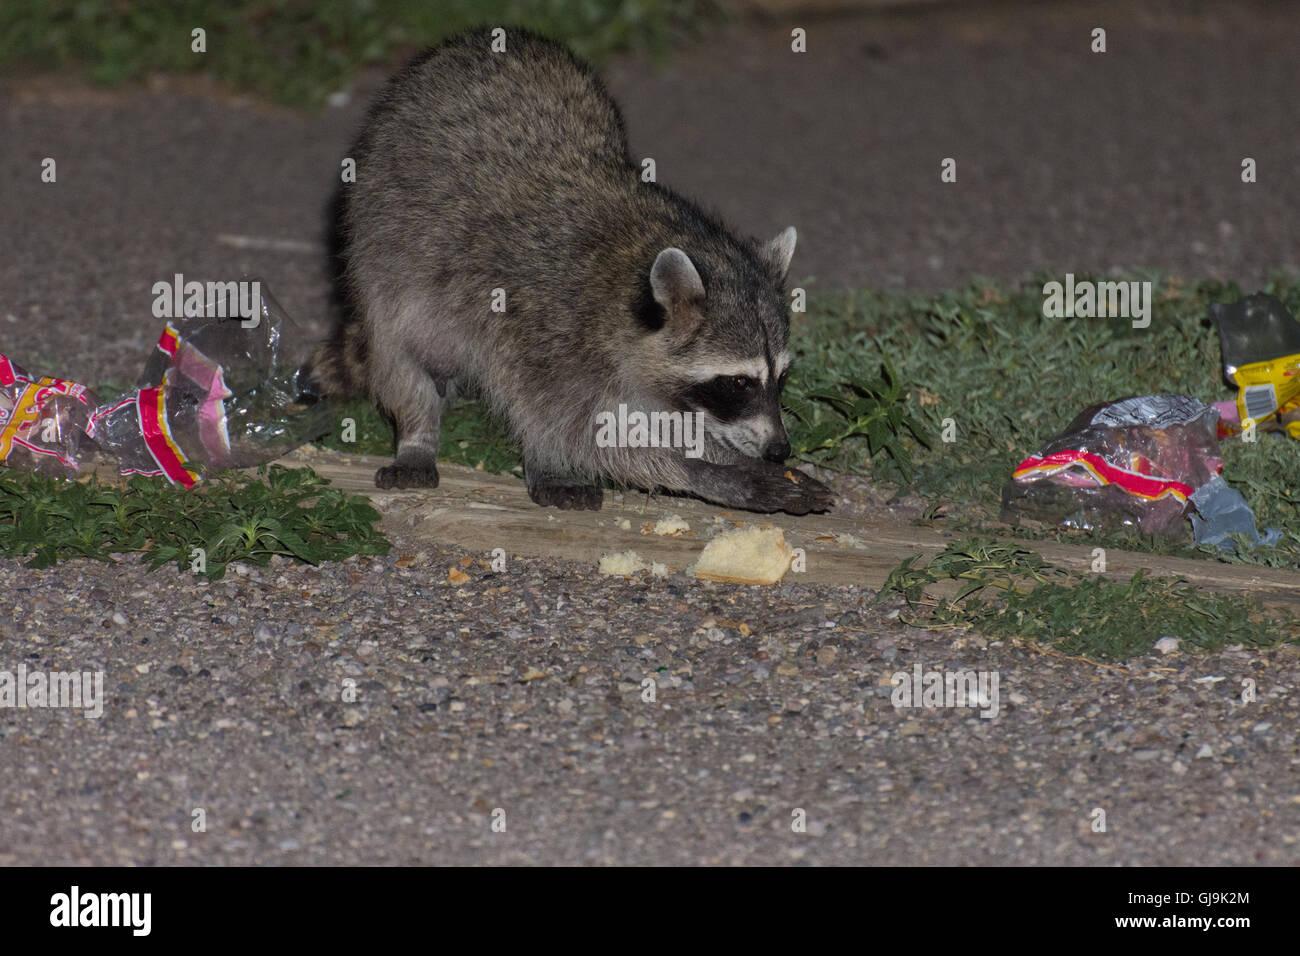 Mapache (Procyon lotor), comer basura. Elephant Butte State Park, Nuevo México, EE.UU. Imagen De Stock